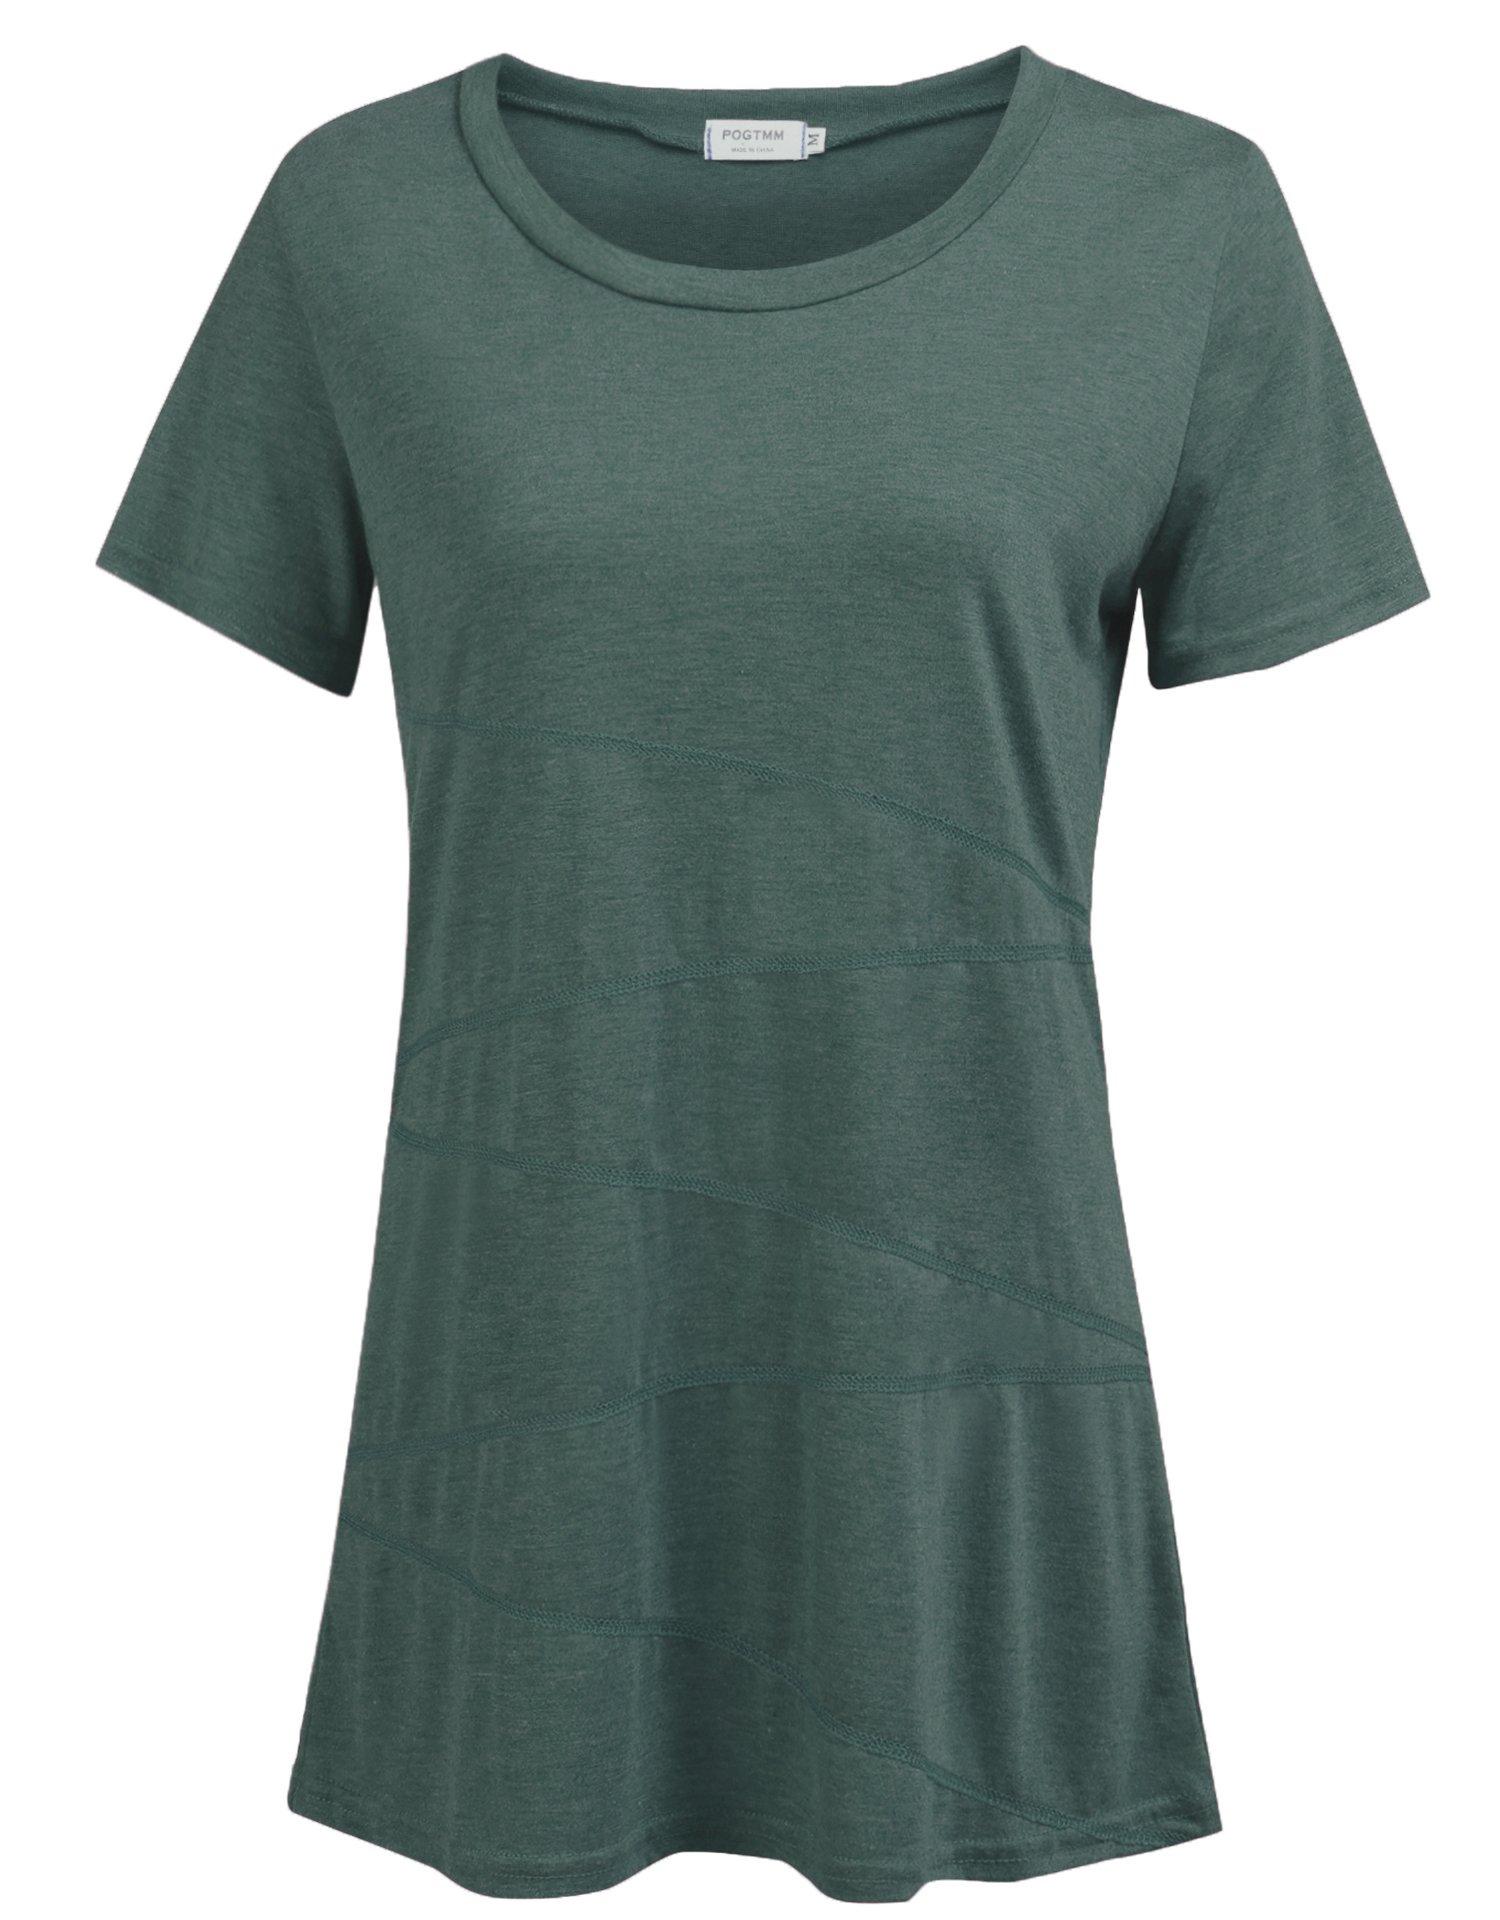 POGTMM Women's Casual Loose Short Sleeve Shirts Yoga Tops Activewear Running Workout T-Shirt Blouse (Green, US L(12-14))